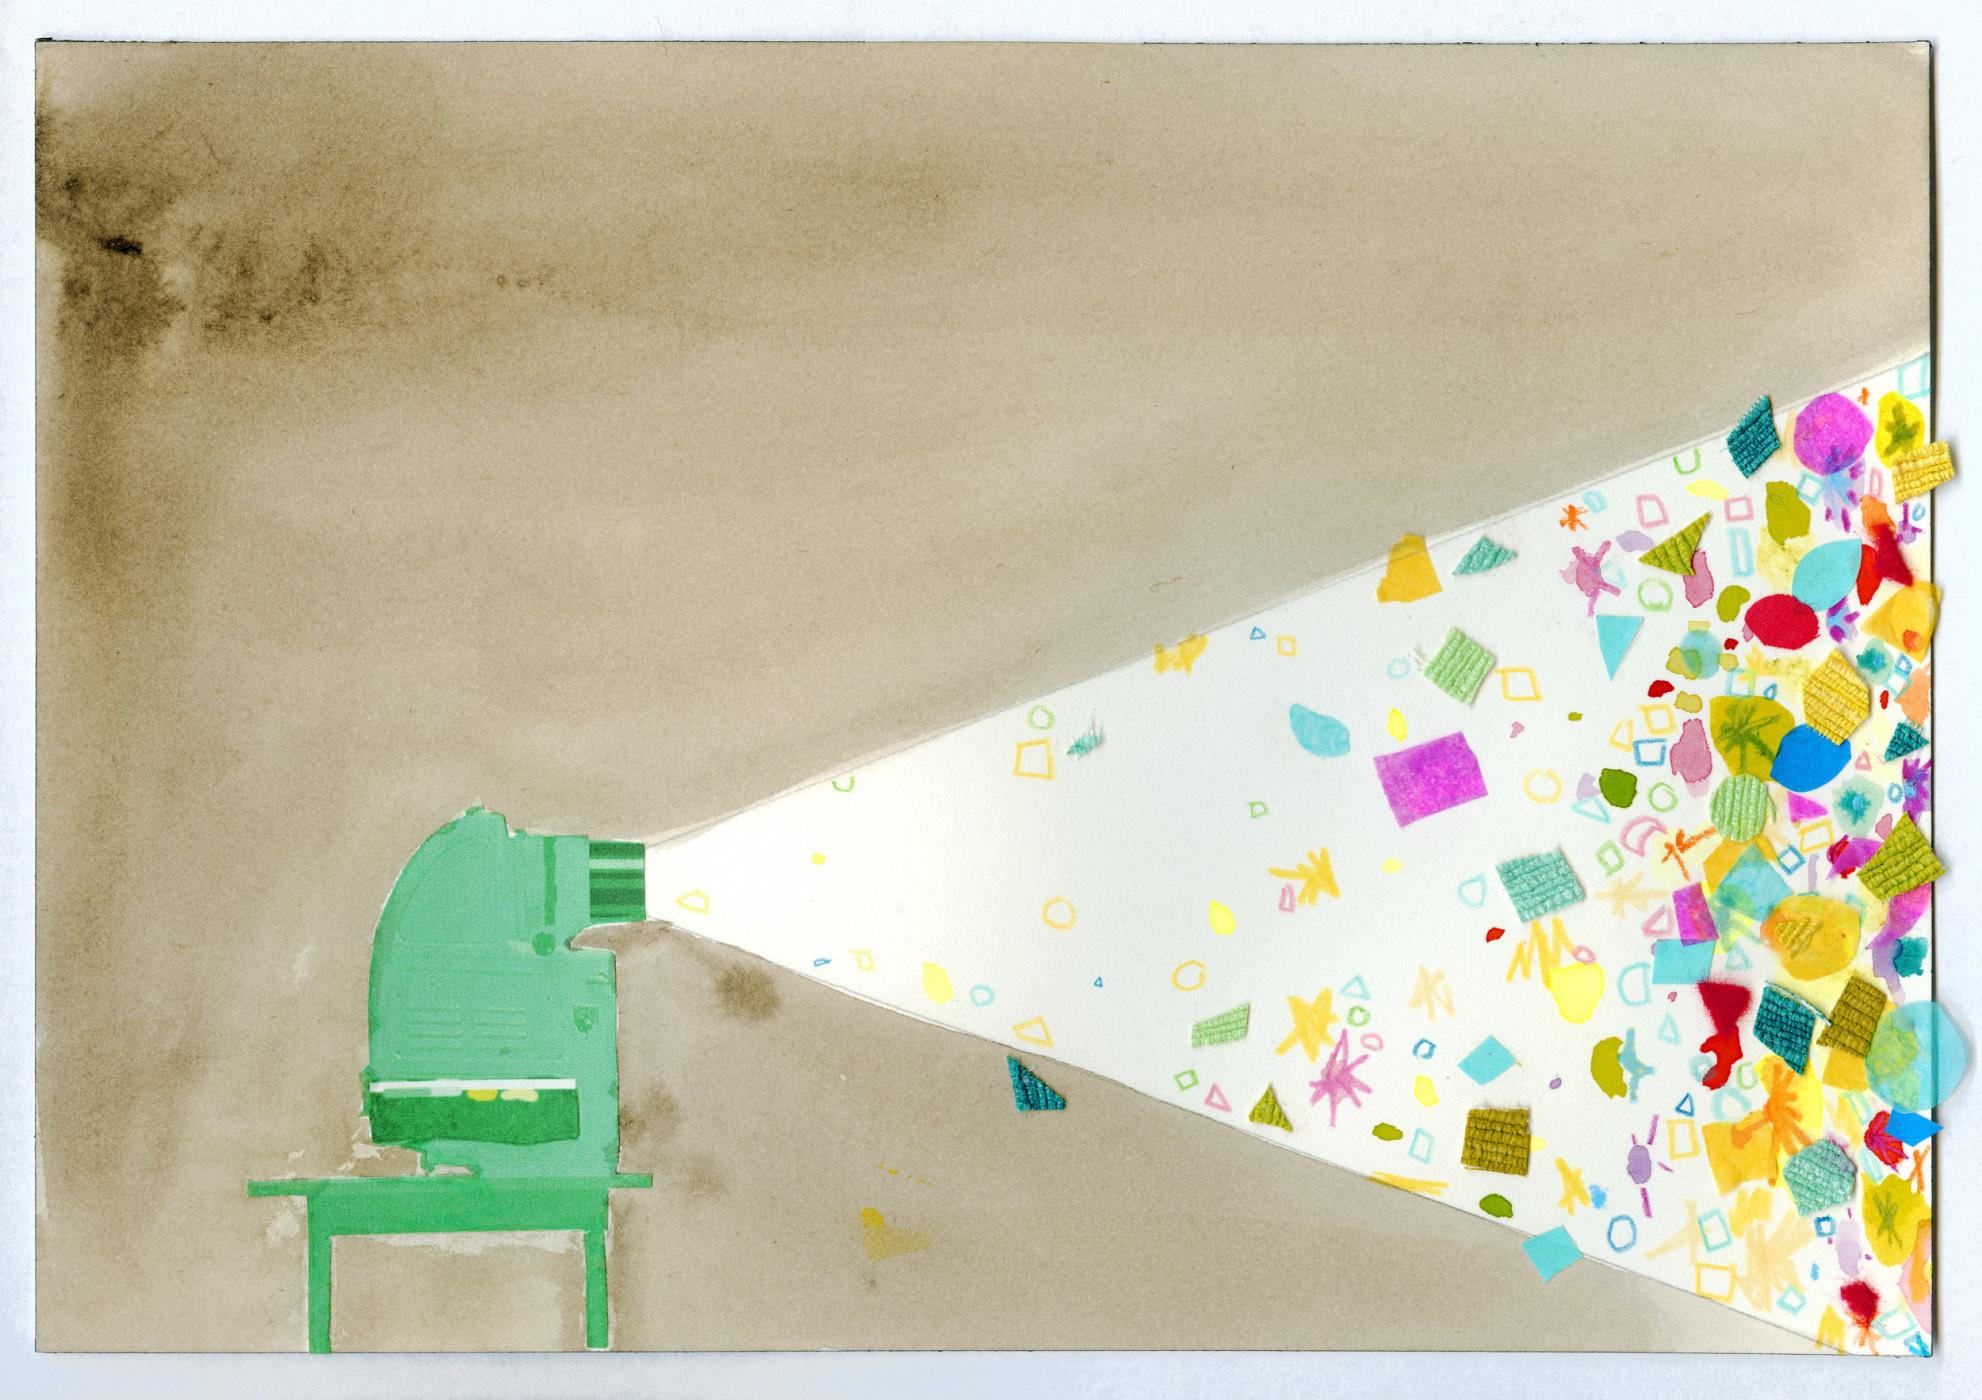 "<div class=""title""><em>Edgar Bryan</em>, 2003</div><div class=""medium"">watercolour and collage on paper</div><div class=""dimensions"">17.8 x 25.8 cm<br />7 x 10 1/8 in.</div>"